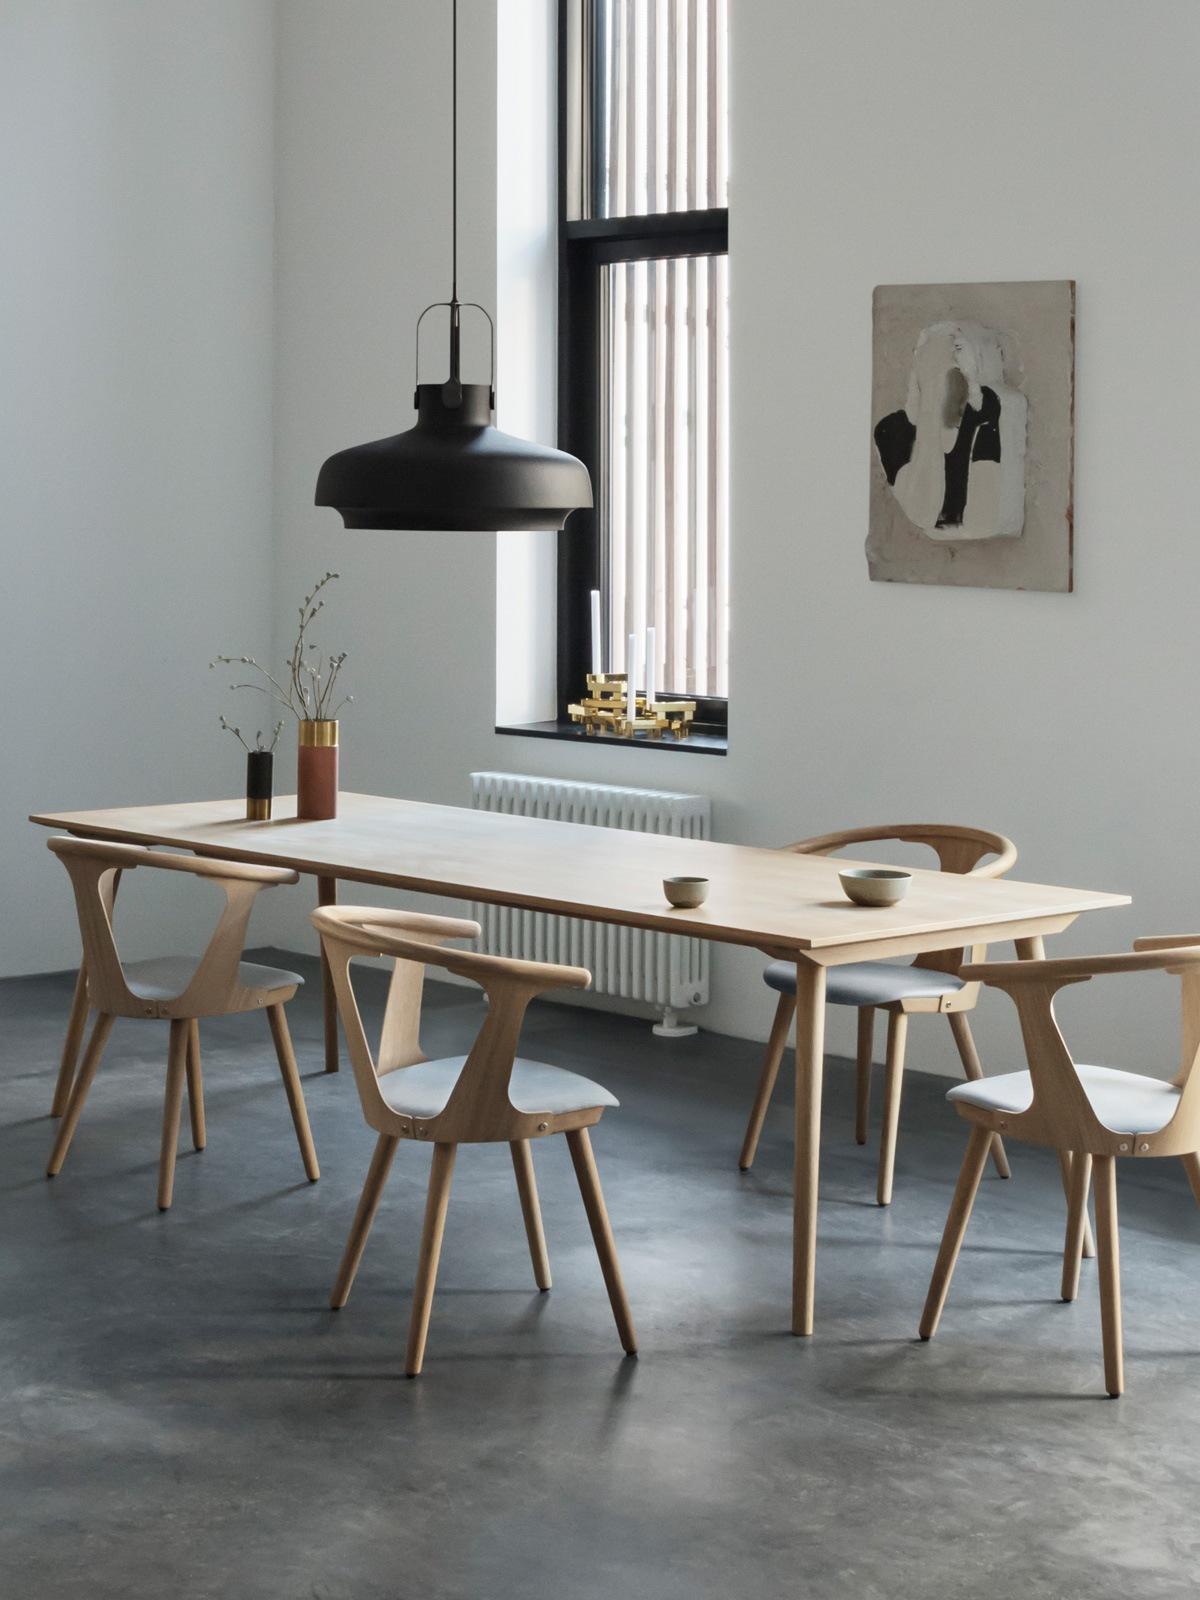 Copenhagen SC8 im Schwarz &tradition Designort Lampen Berlin